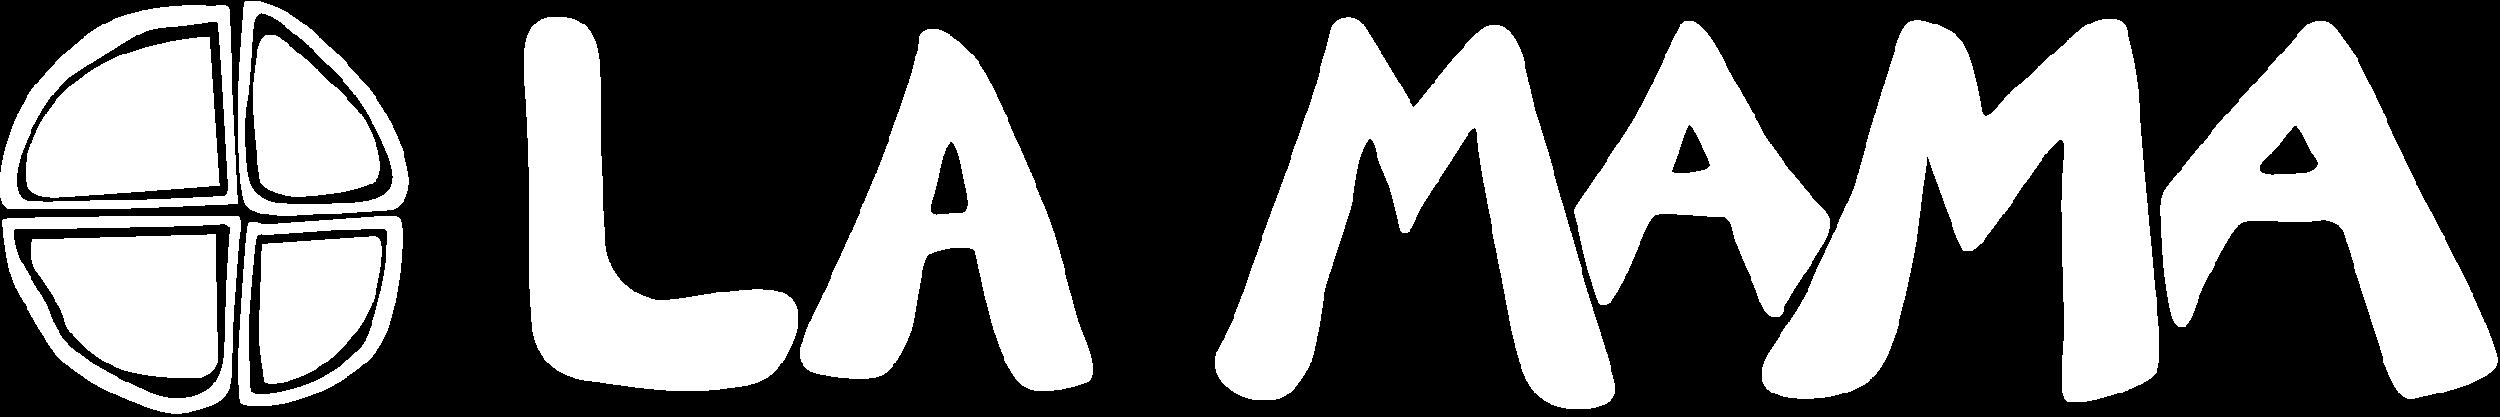 lamama-inverted.png